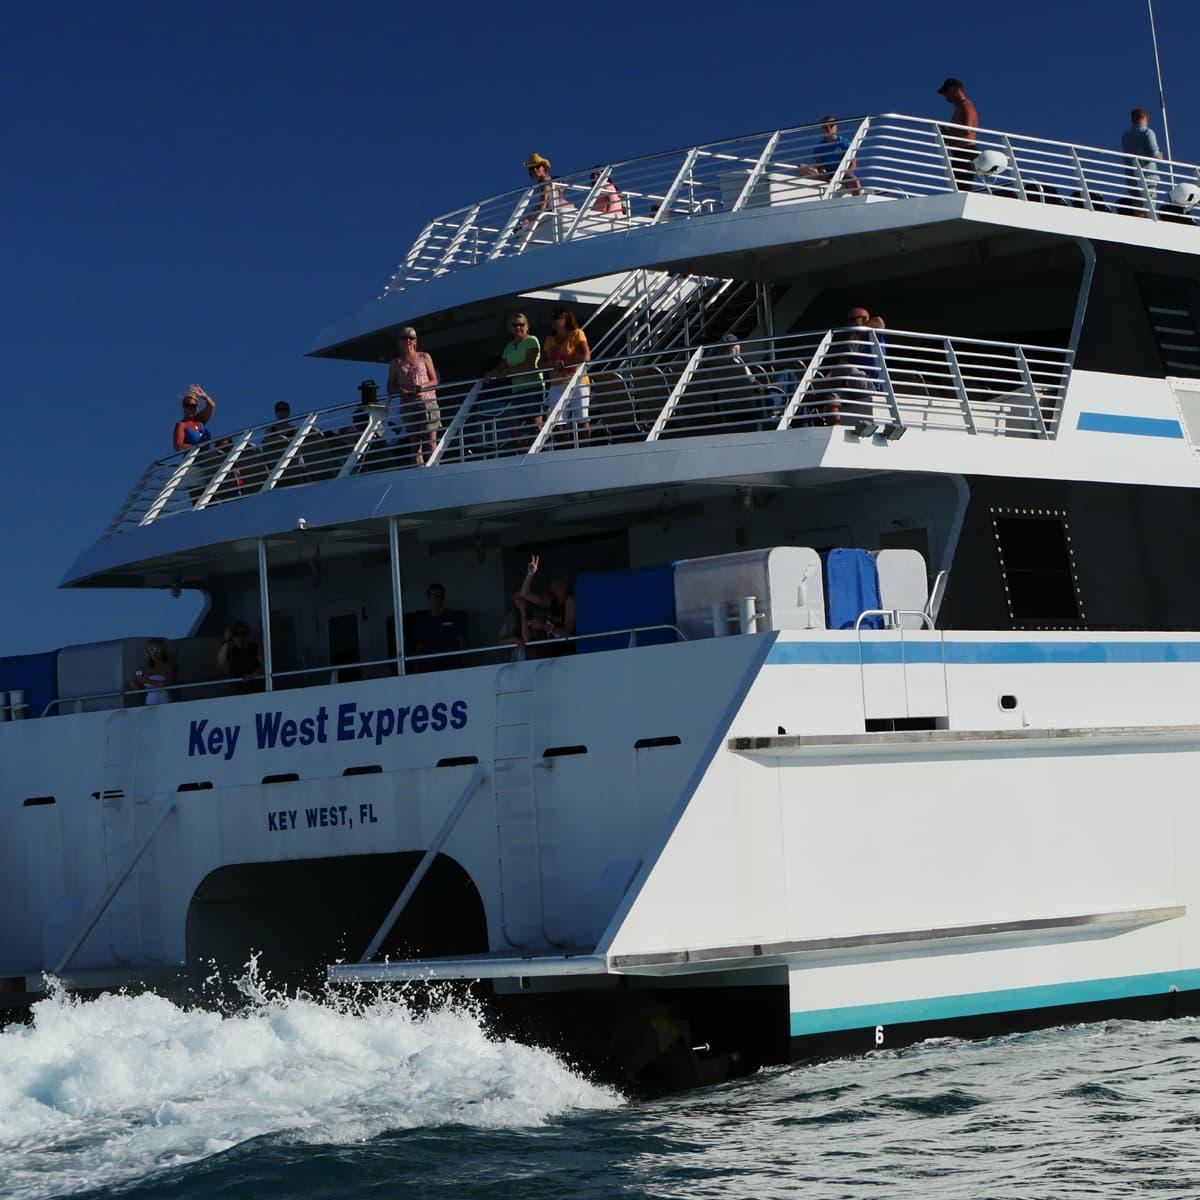 Key West Express Boat